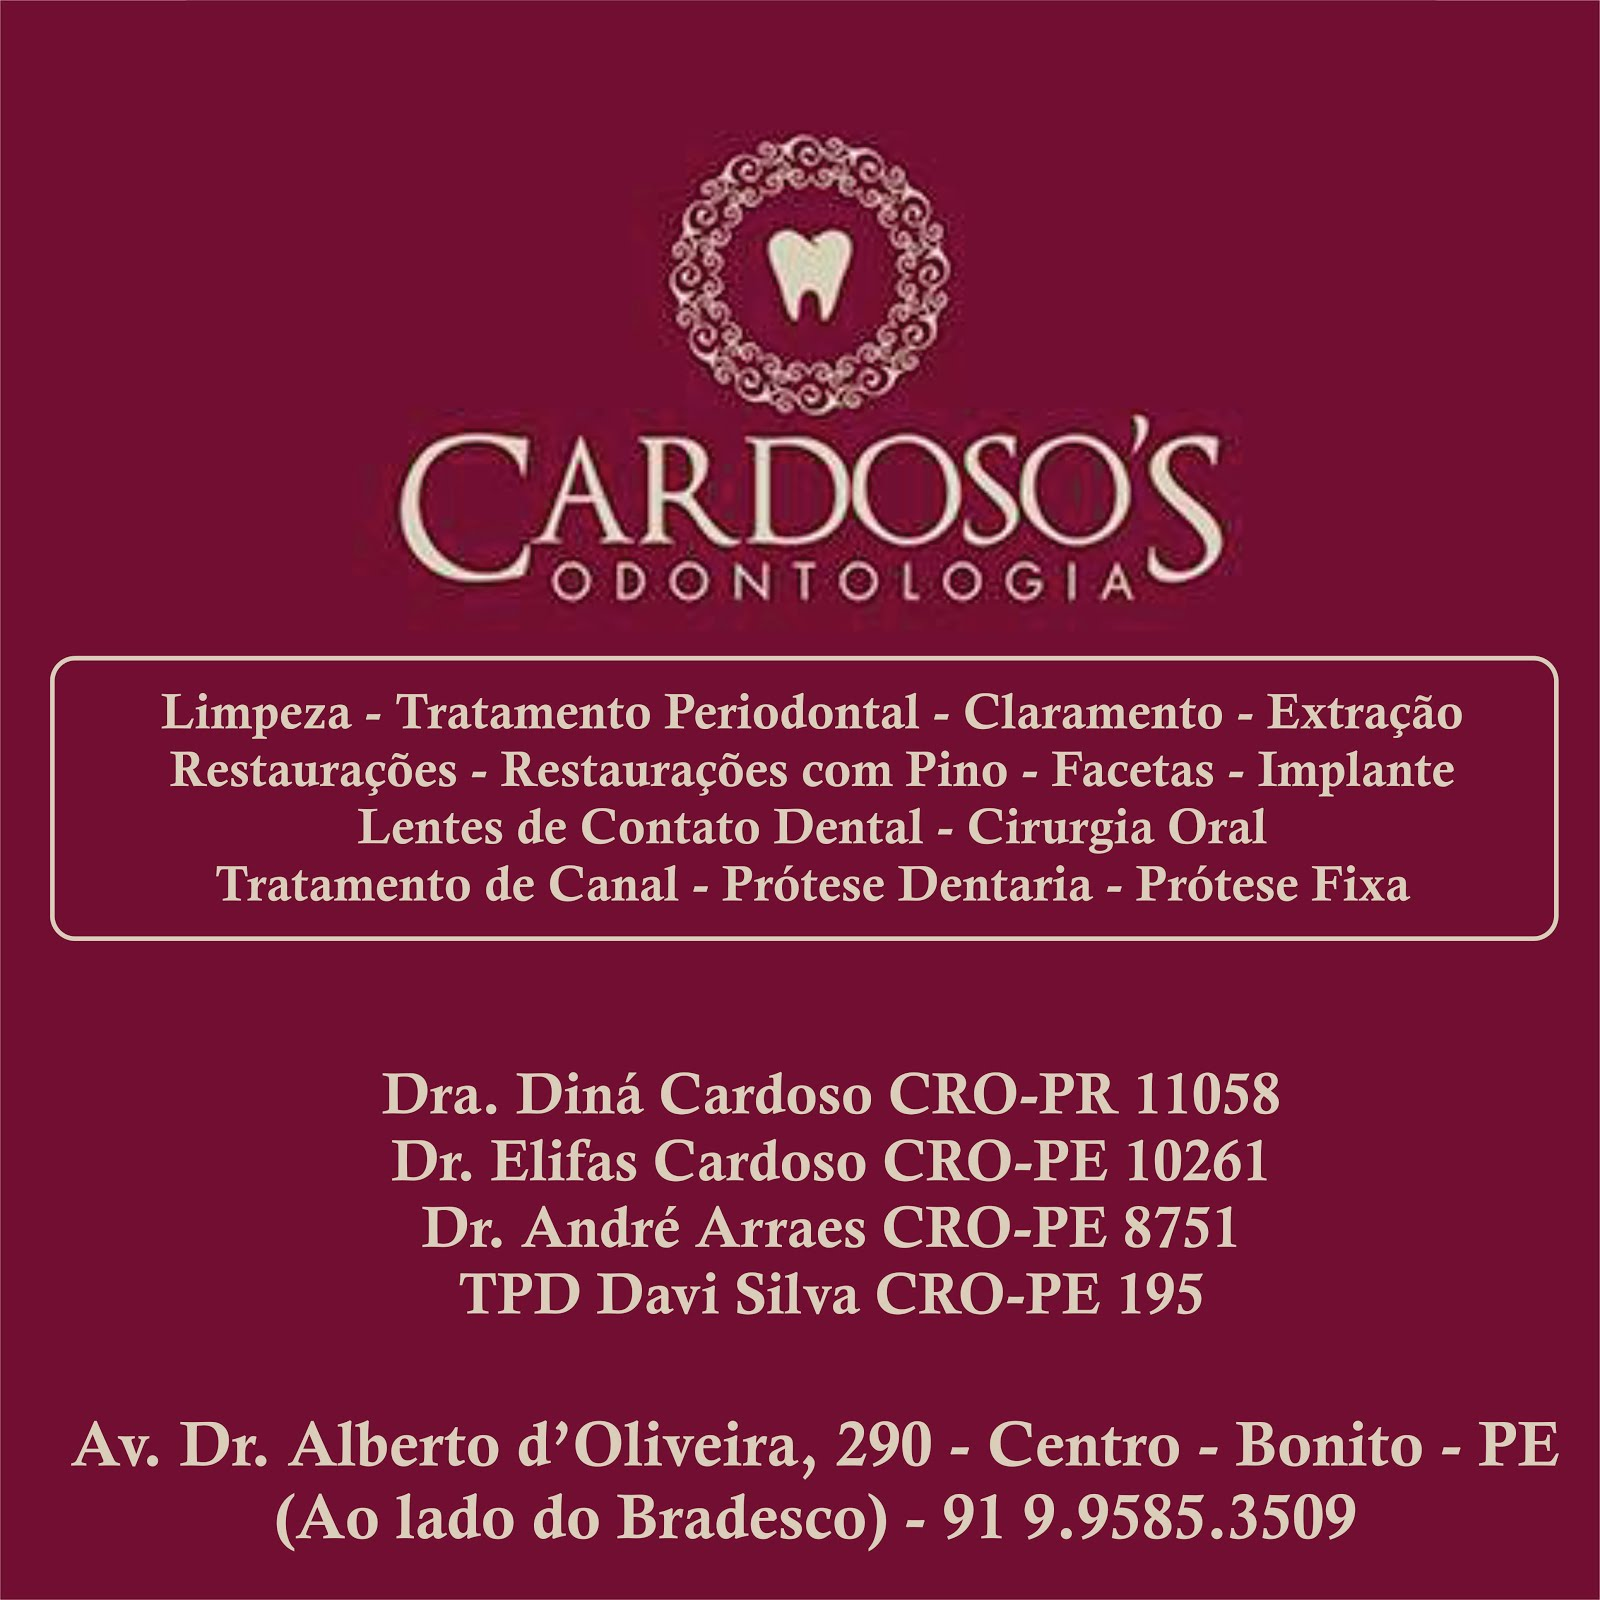 Cardoso's Odontologia